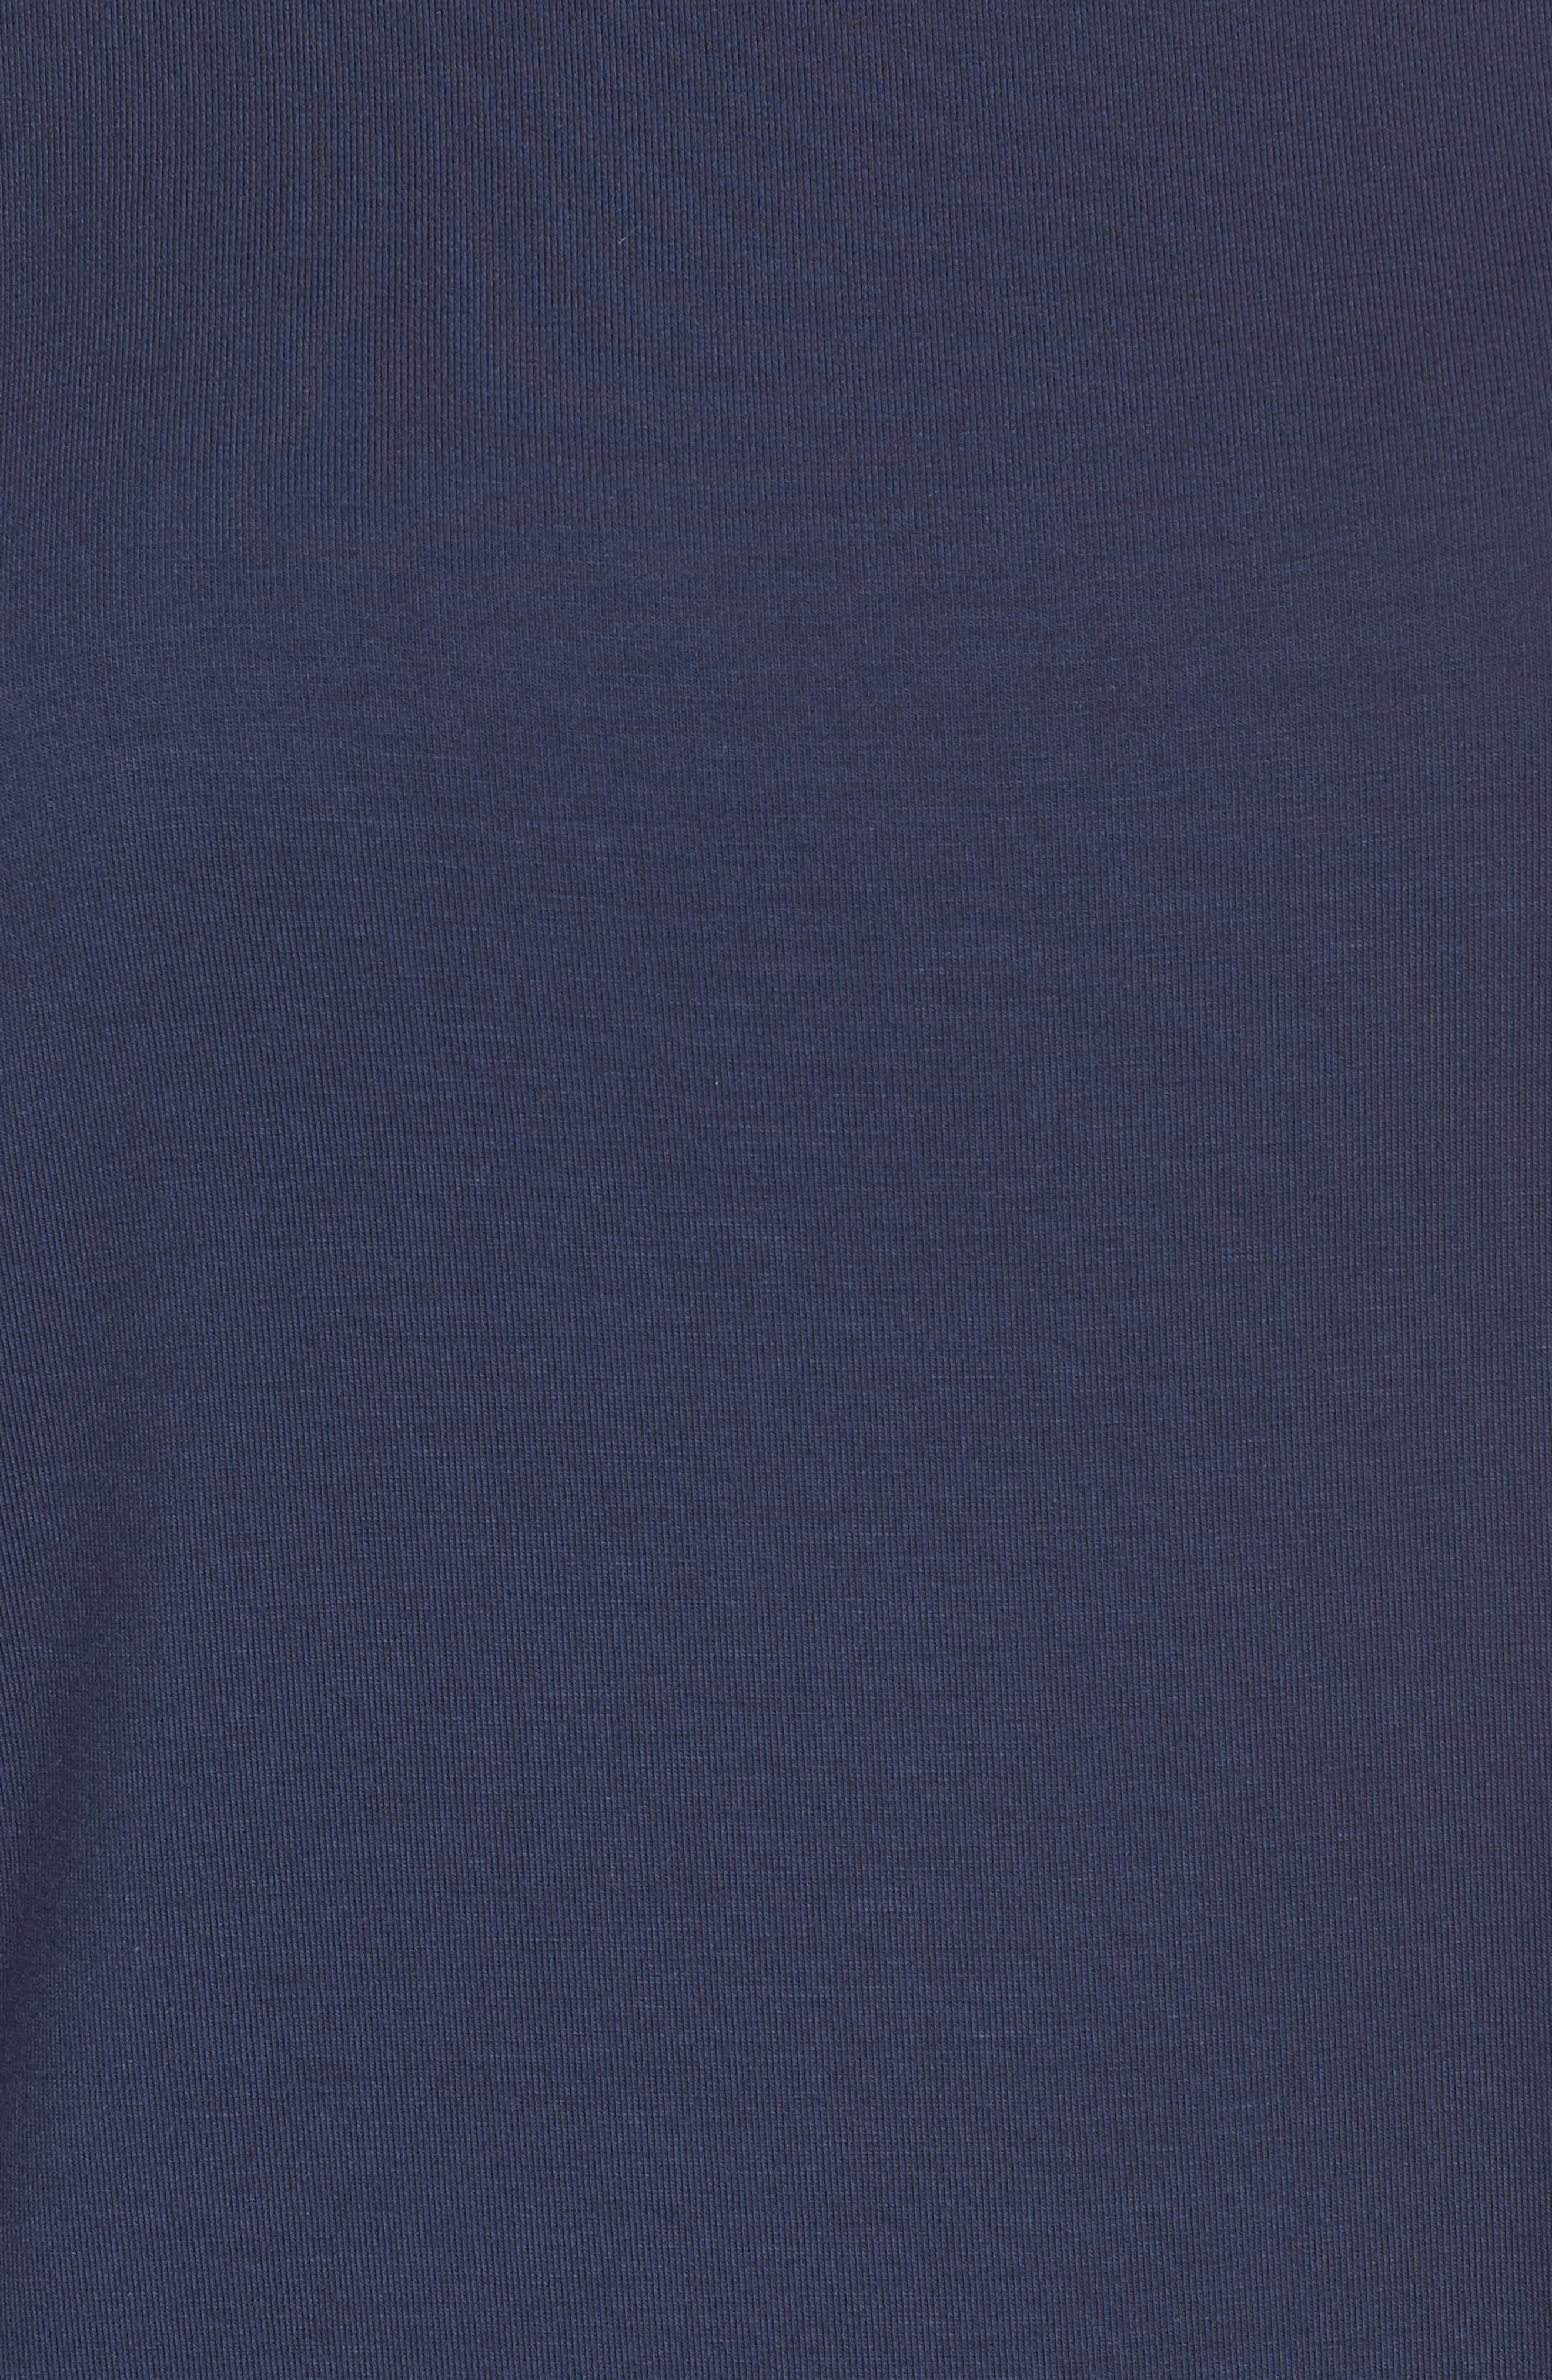 Pajama Tee,                             Alternate thumbnail 8, color,                             Navy